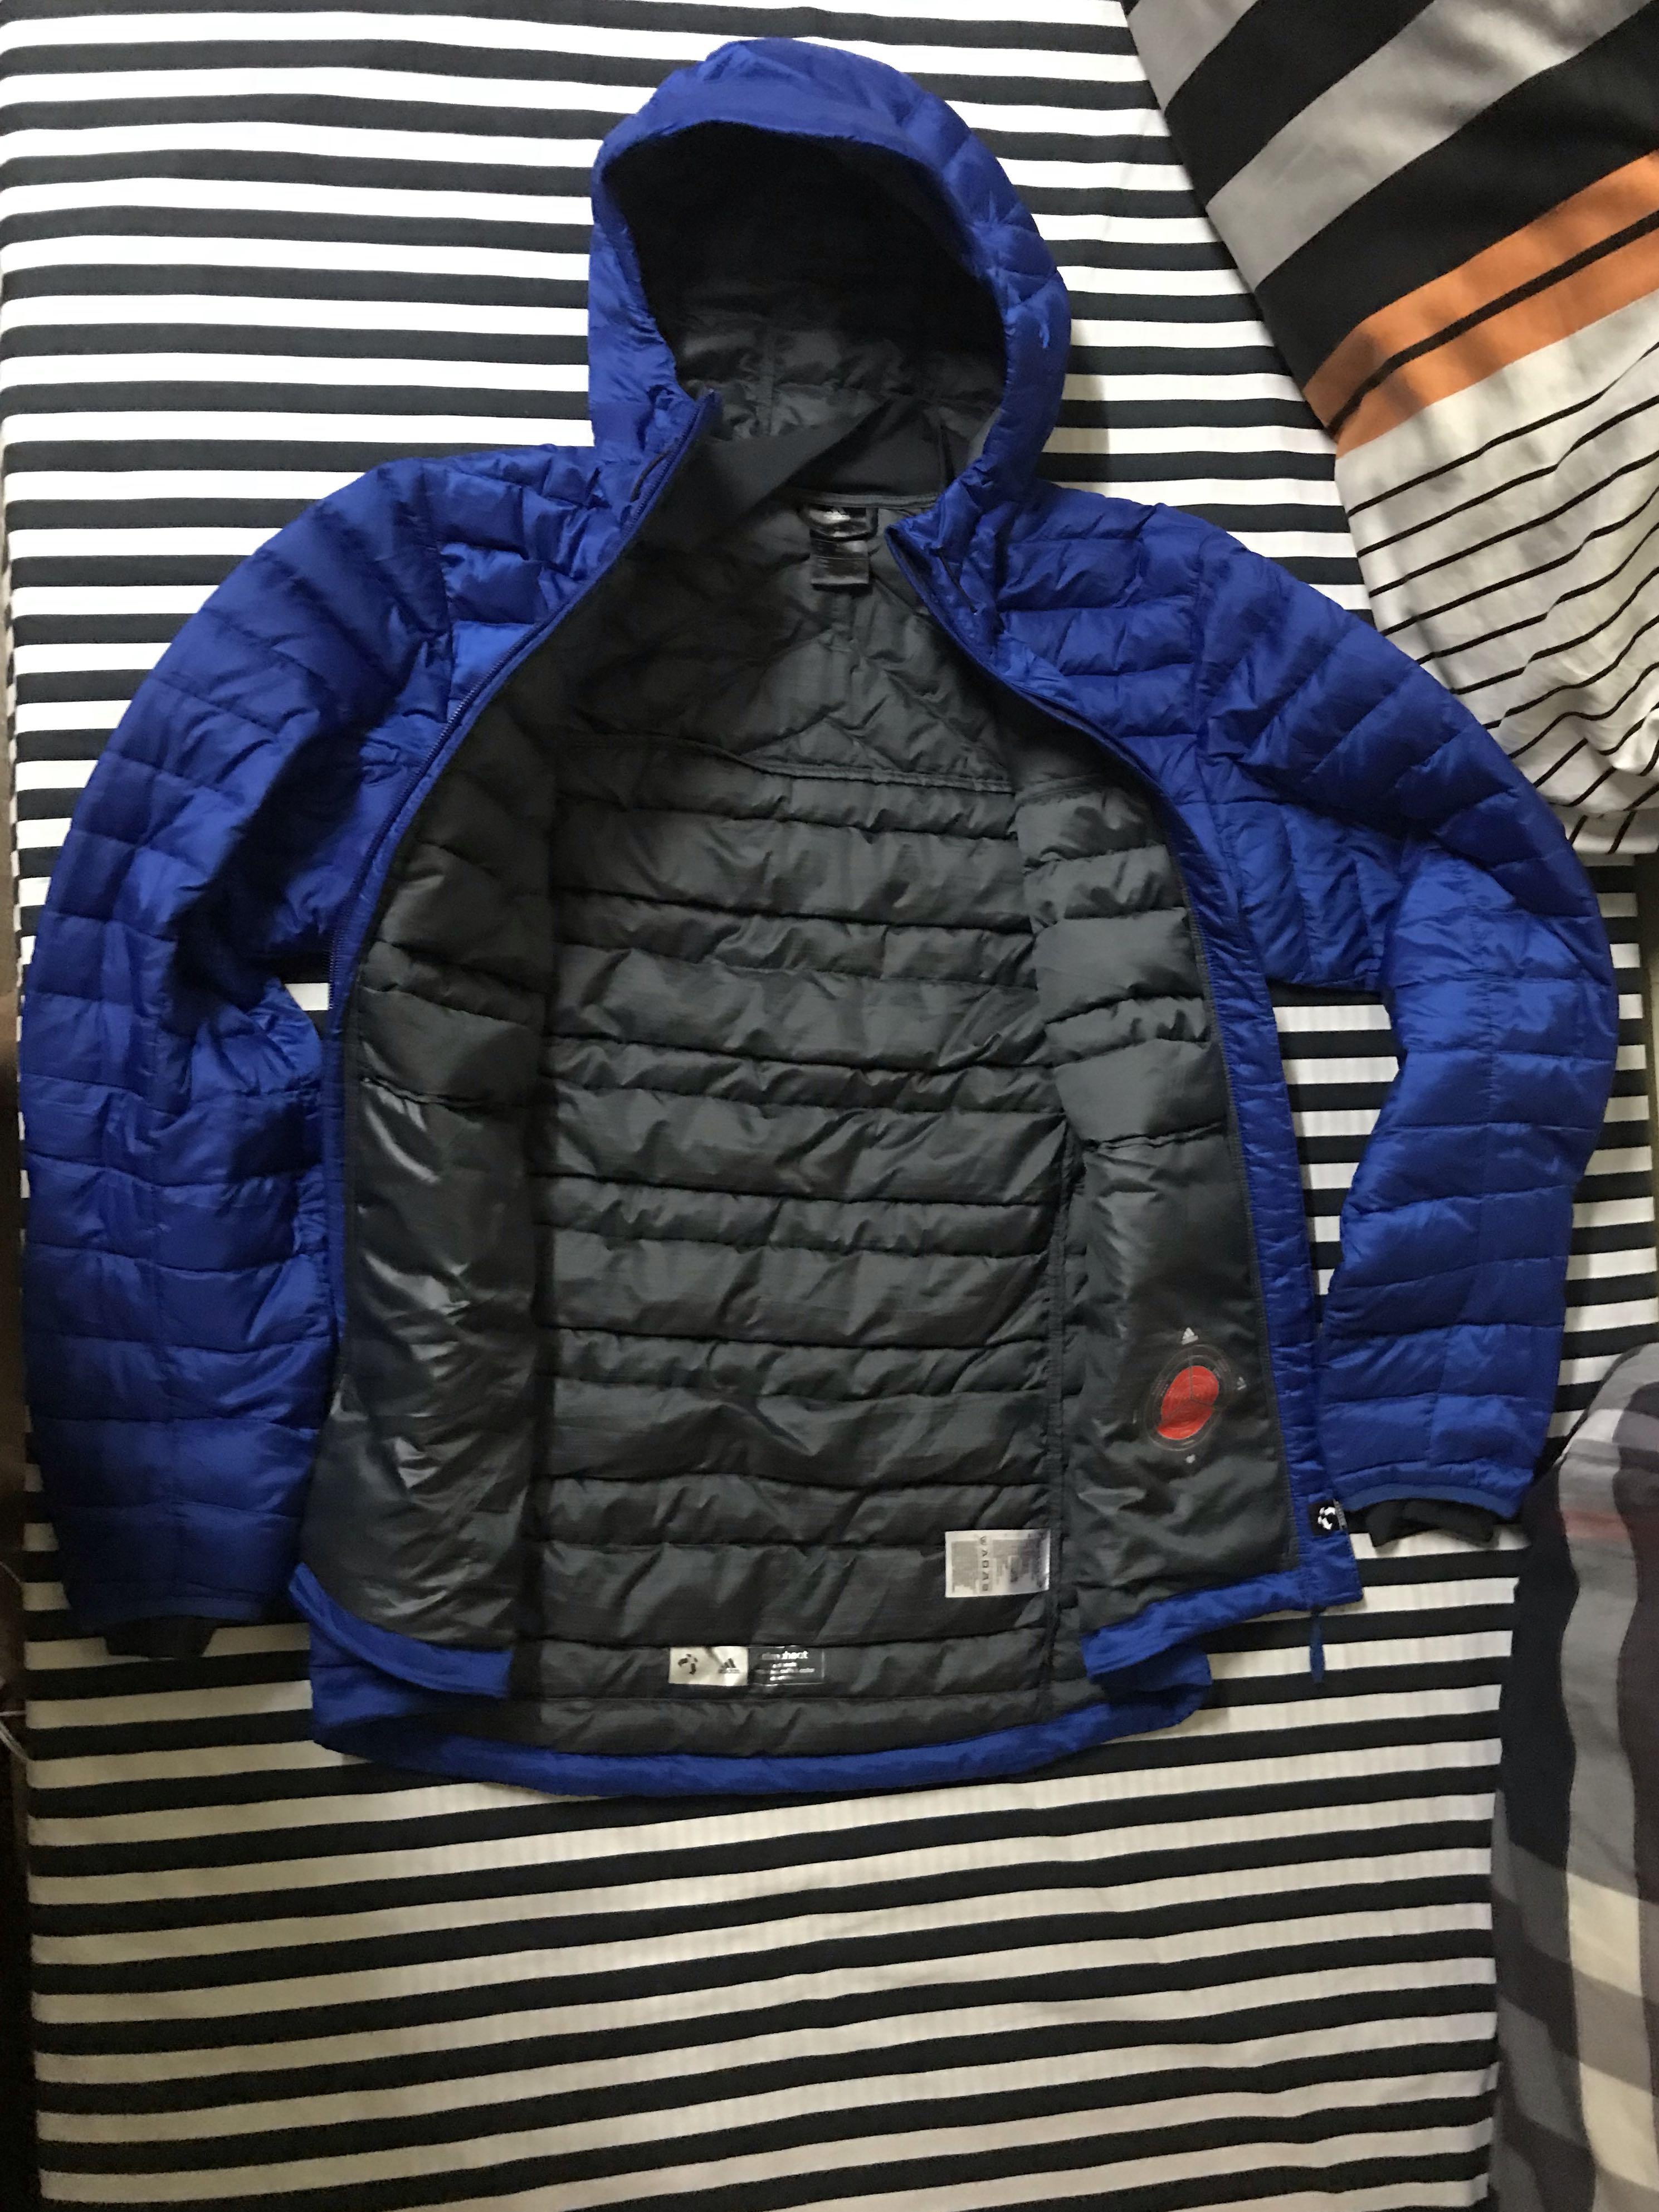 a5cc82b9c9fa6 ADIDAS ORIGINAL PUFFER Hoodie Jacket Medium, Men's Fashion, Clothes ...